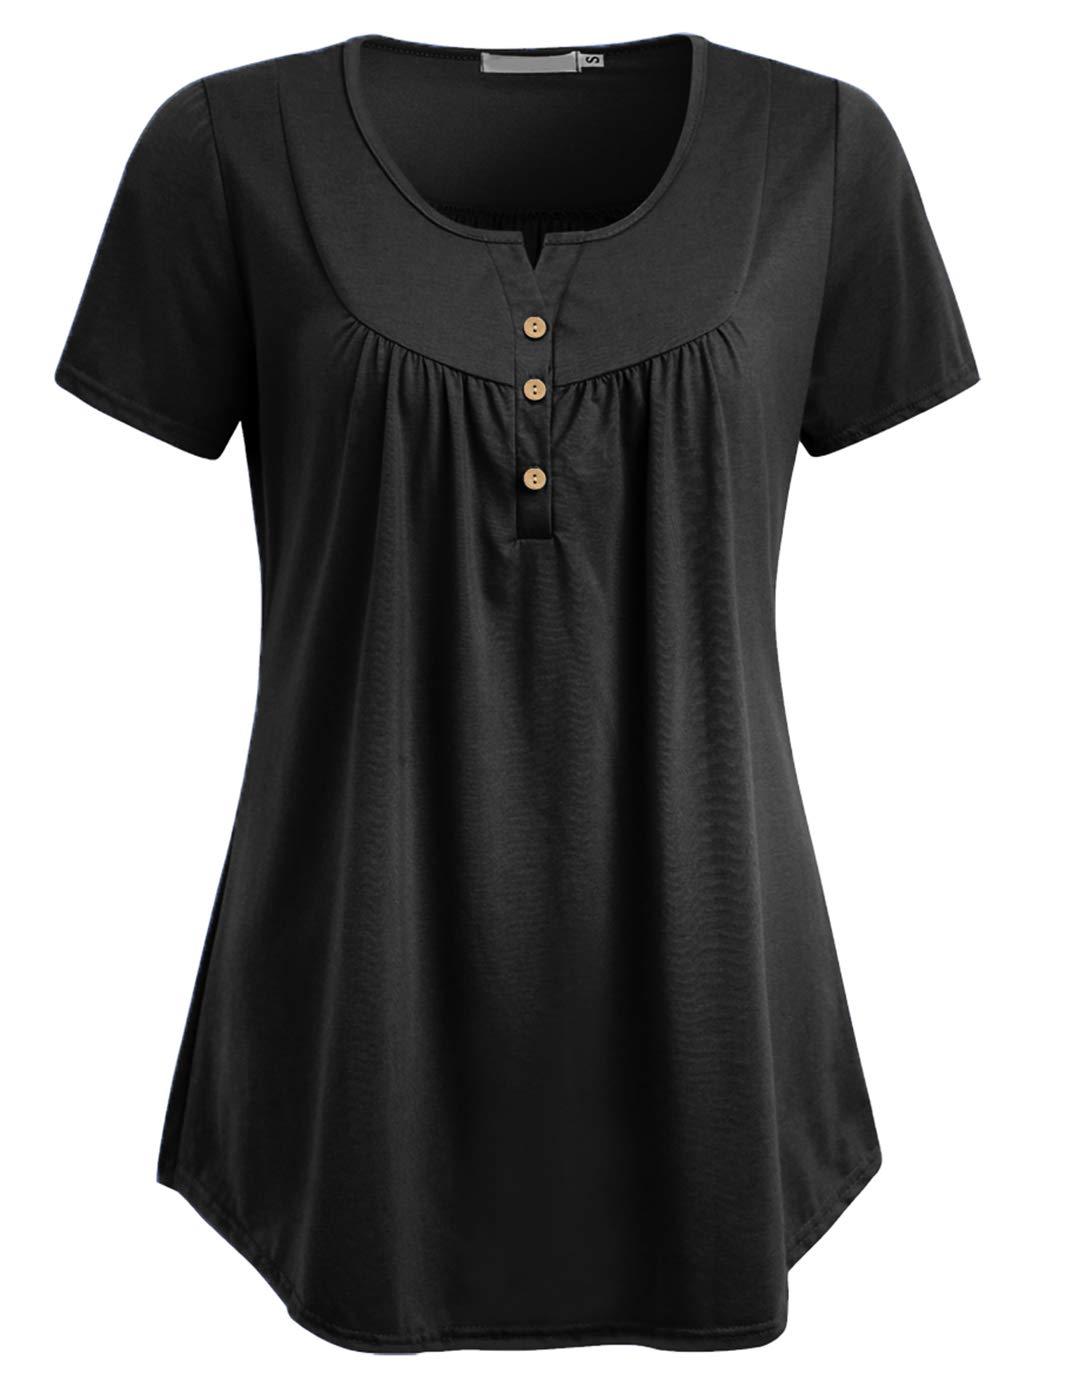 Duteabre Women's Short Sleeve Blouse Henley V Neck Pleated Button up Tunic Shirt Tops Black L